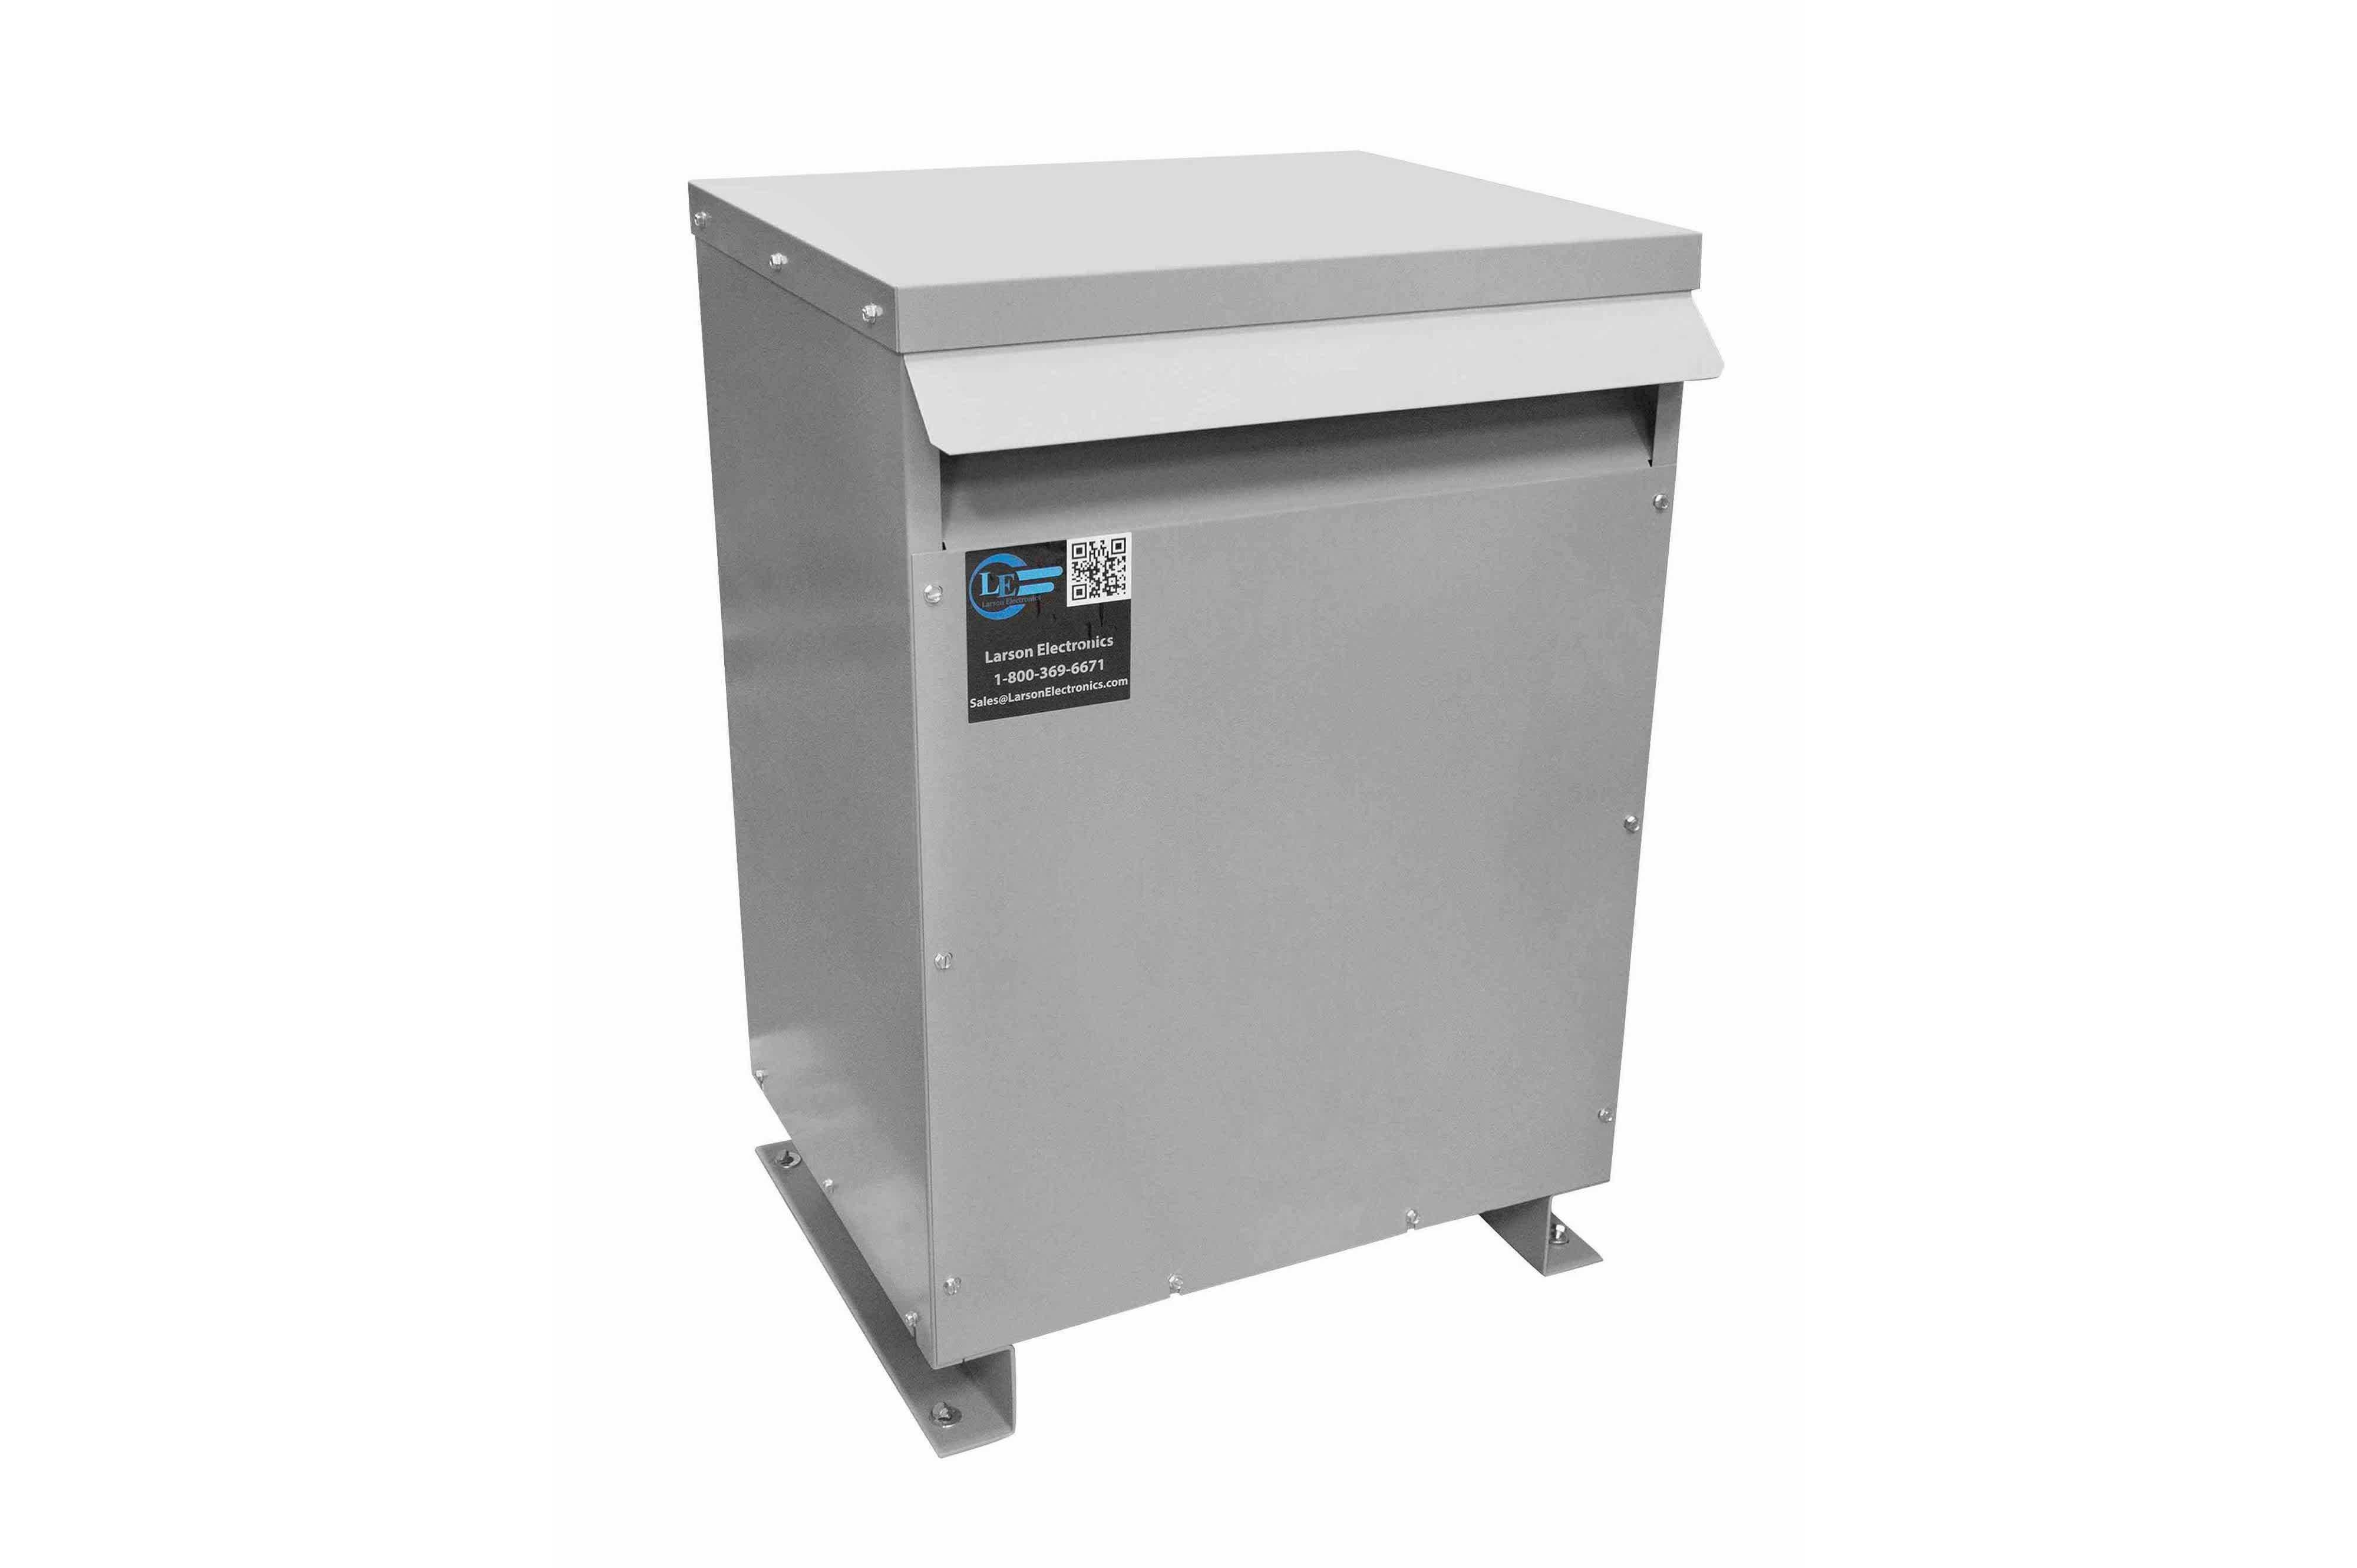 80 kVA 3PH Isolation Transformer, 415V Wye Primary, 240V Delta Secondary, N3R, Ventilated, 60 Hz